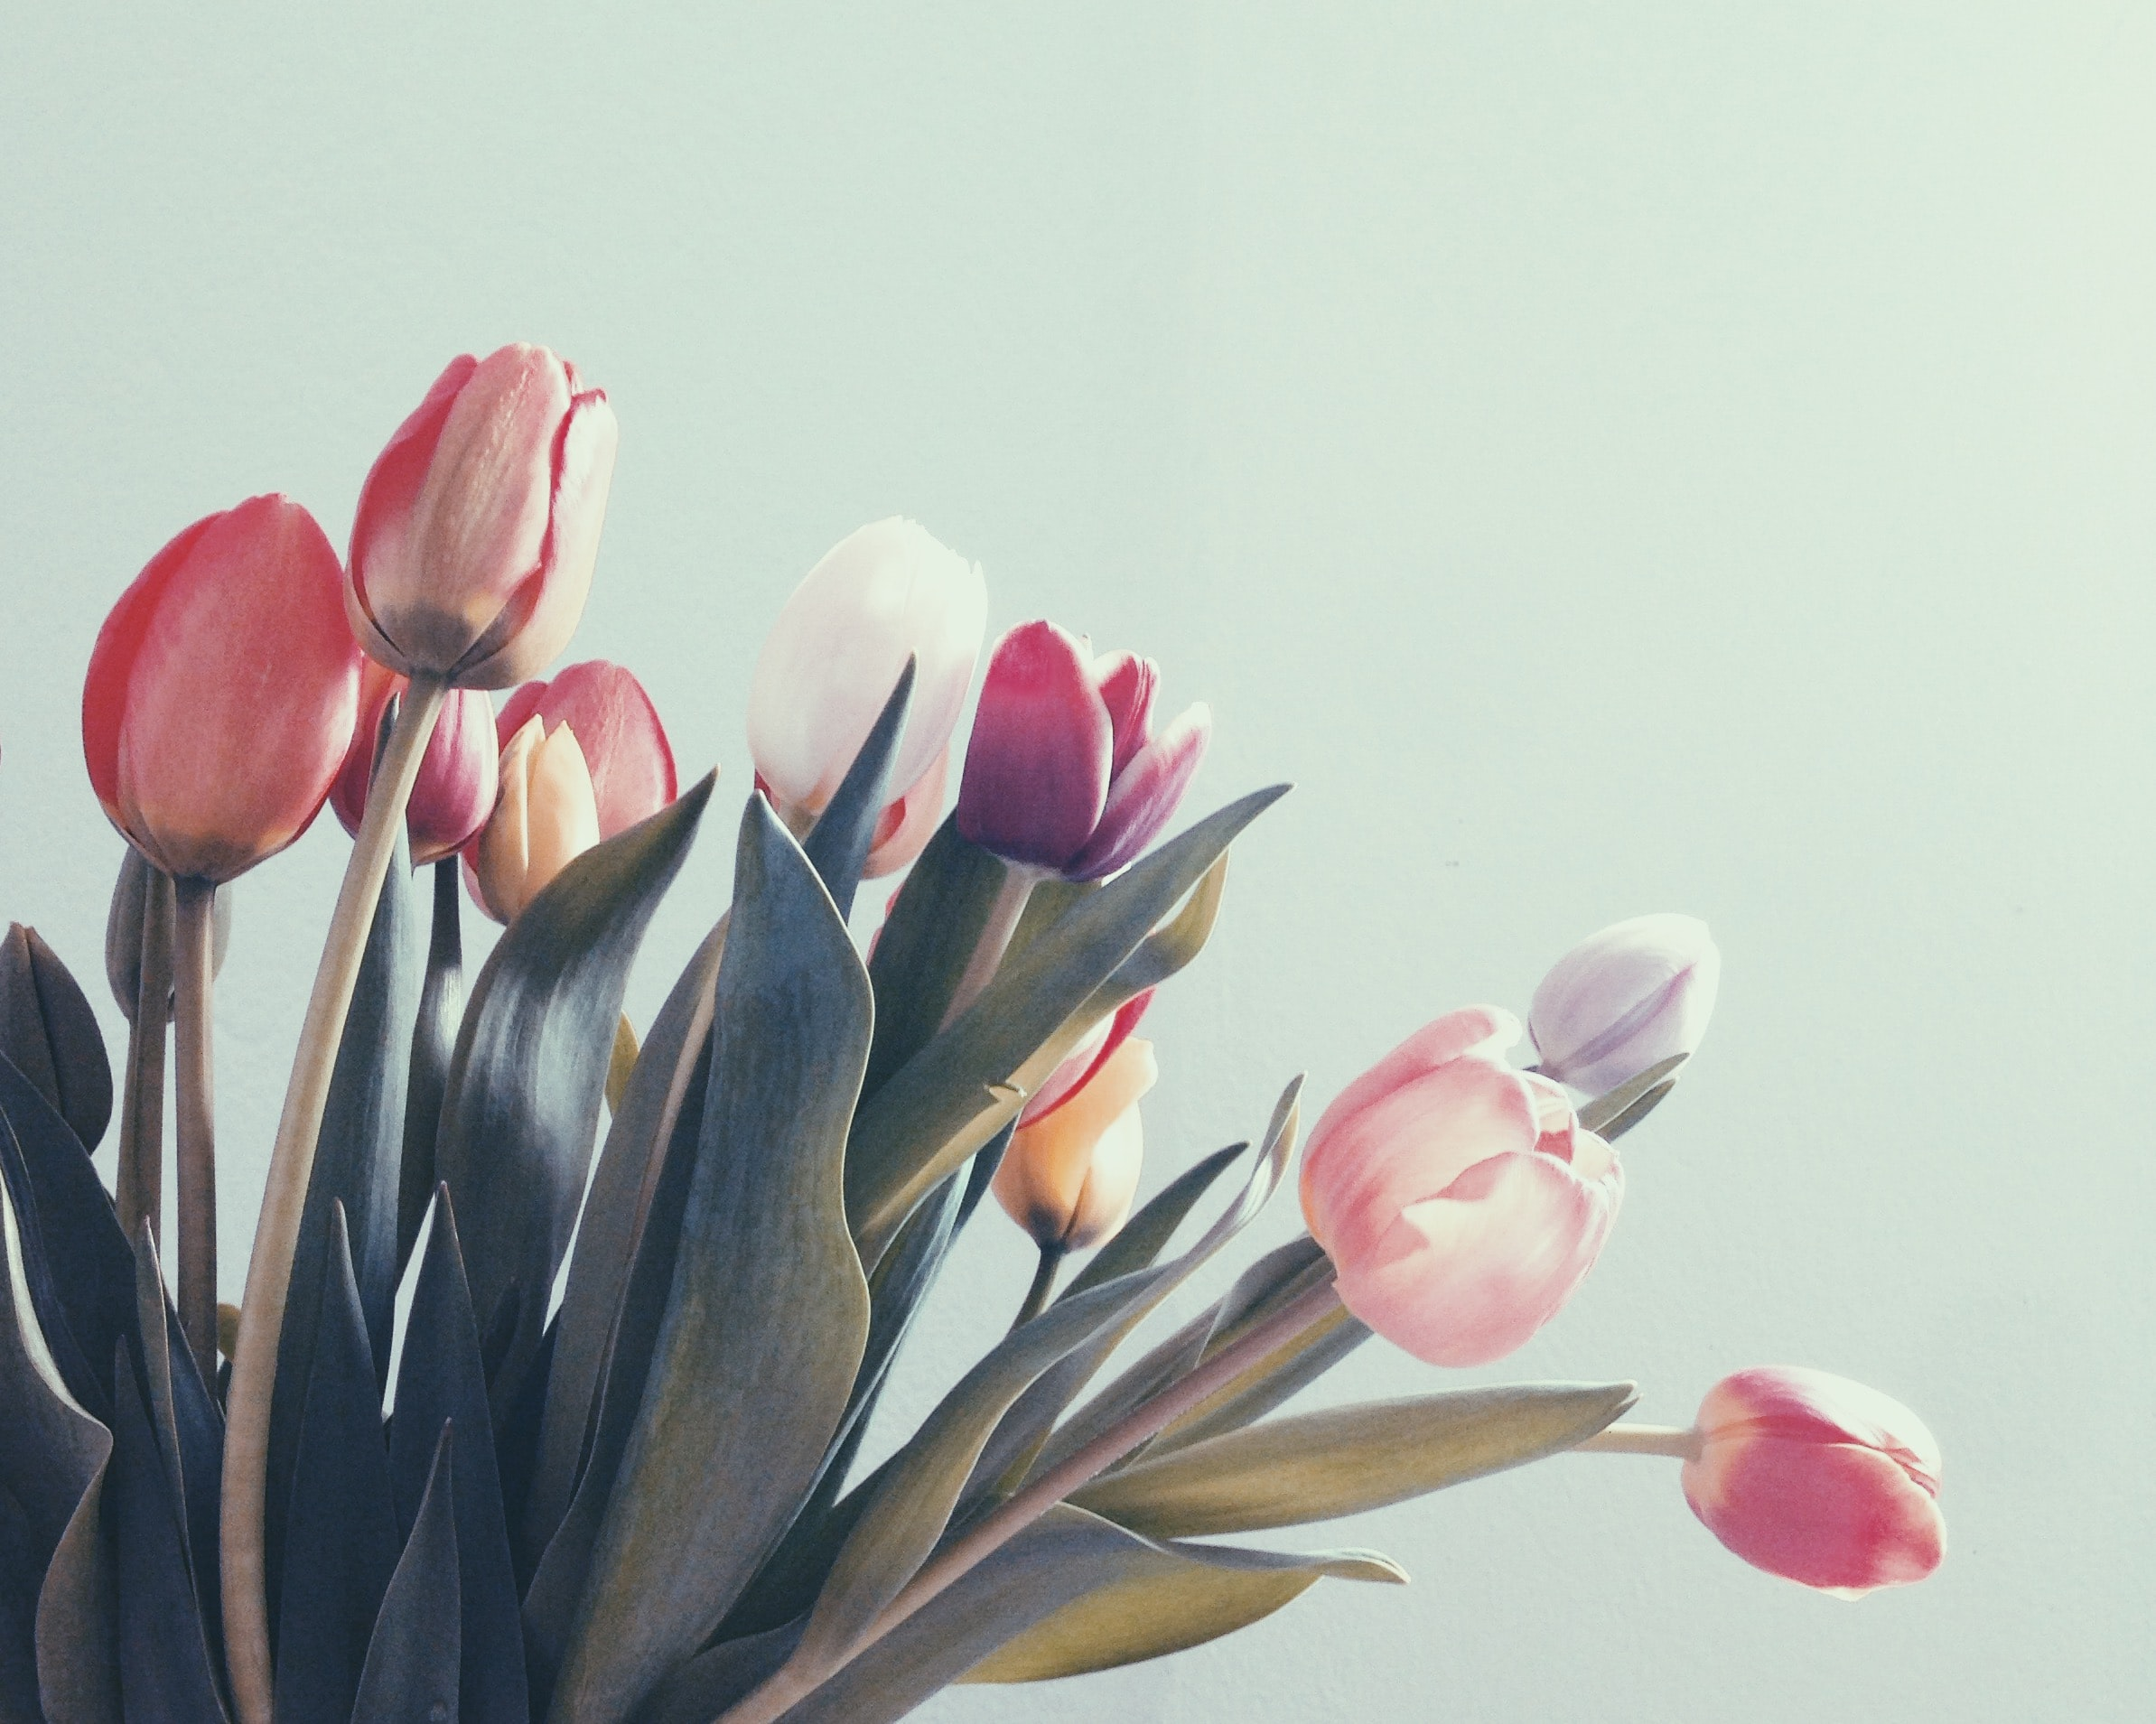 Flowers Pink Tulips Flower Wallpaper x Cool PC